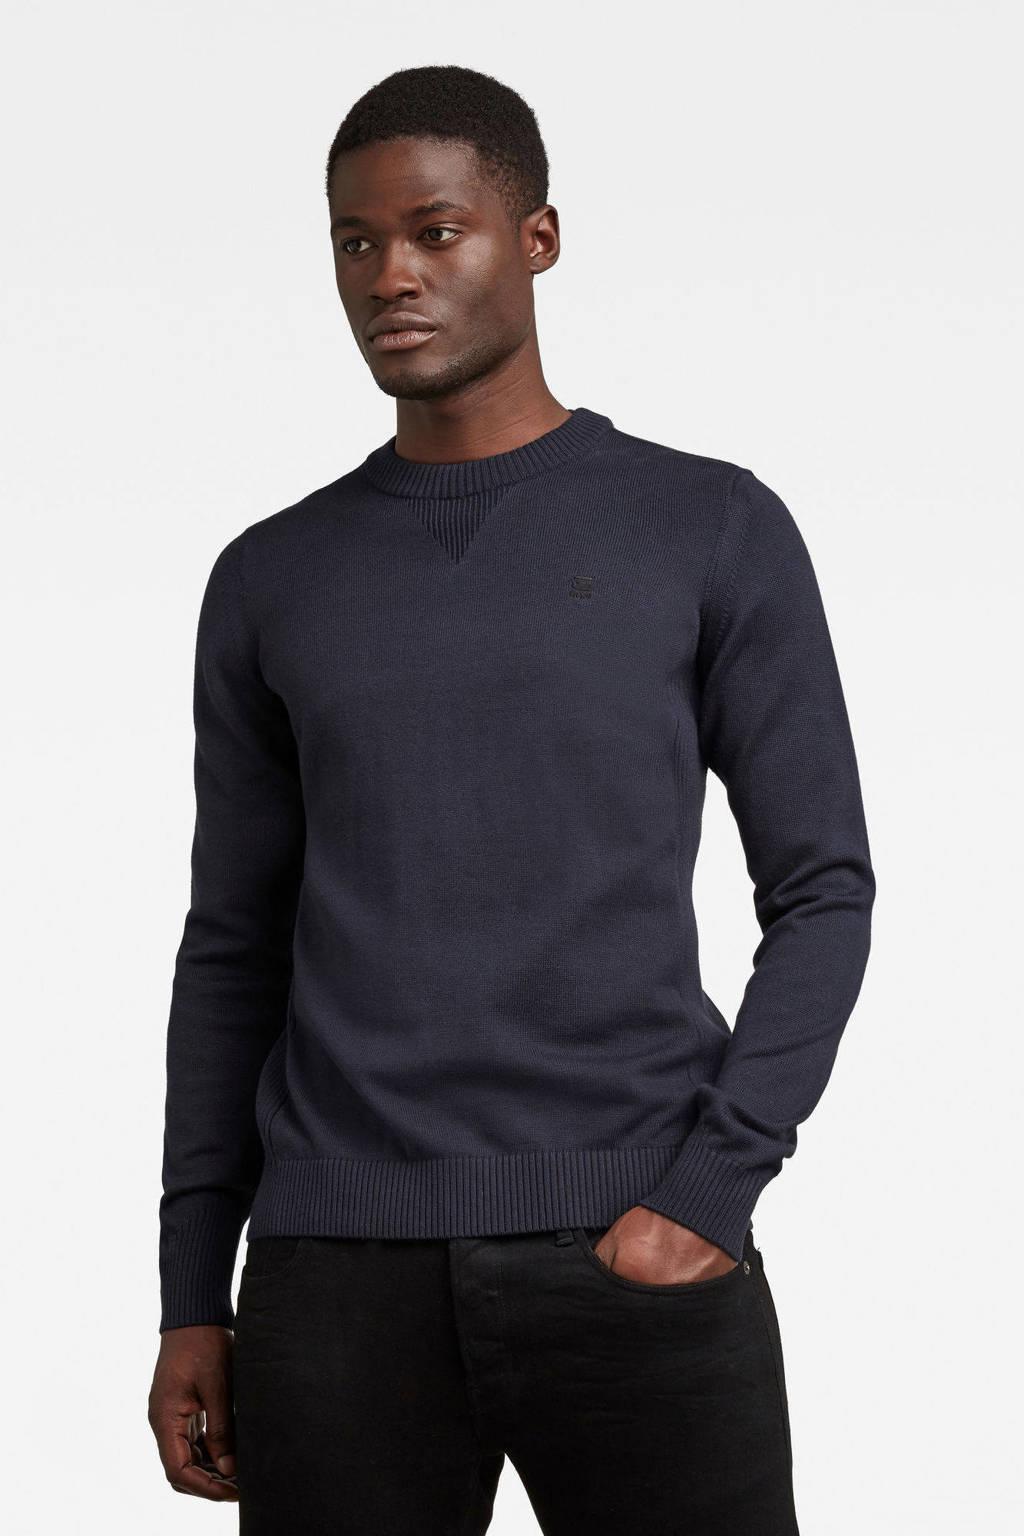 G-Star RAW trui met biologisch katoen donkerblauw, Donkerblauw